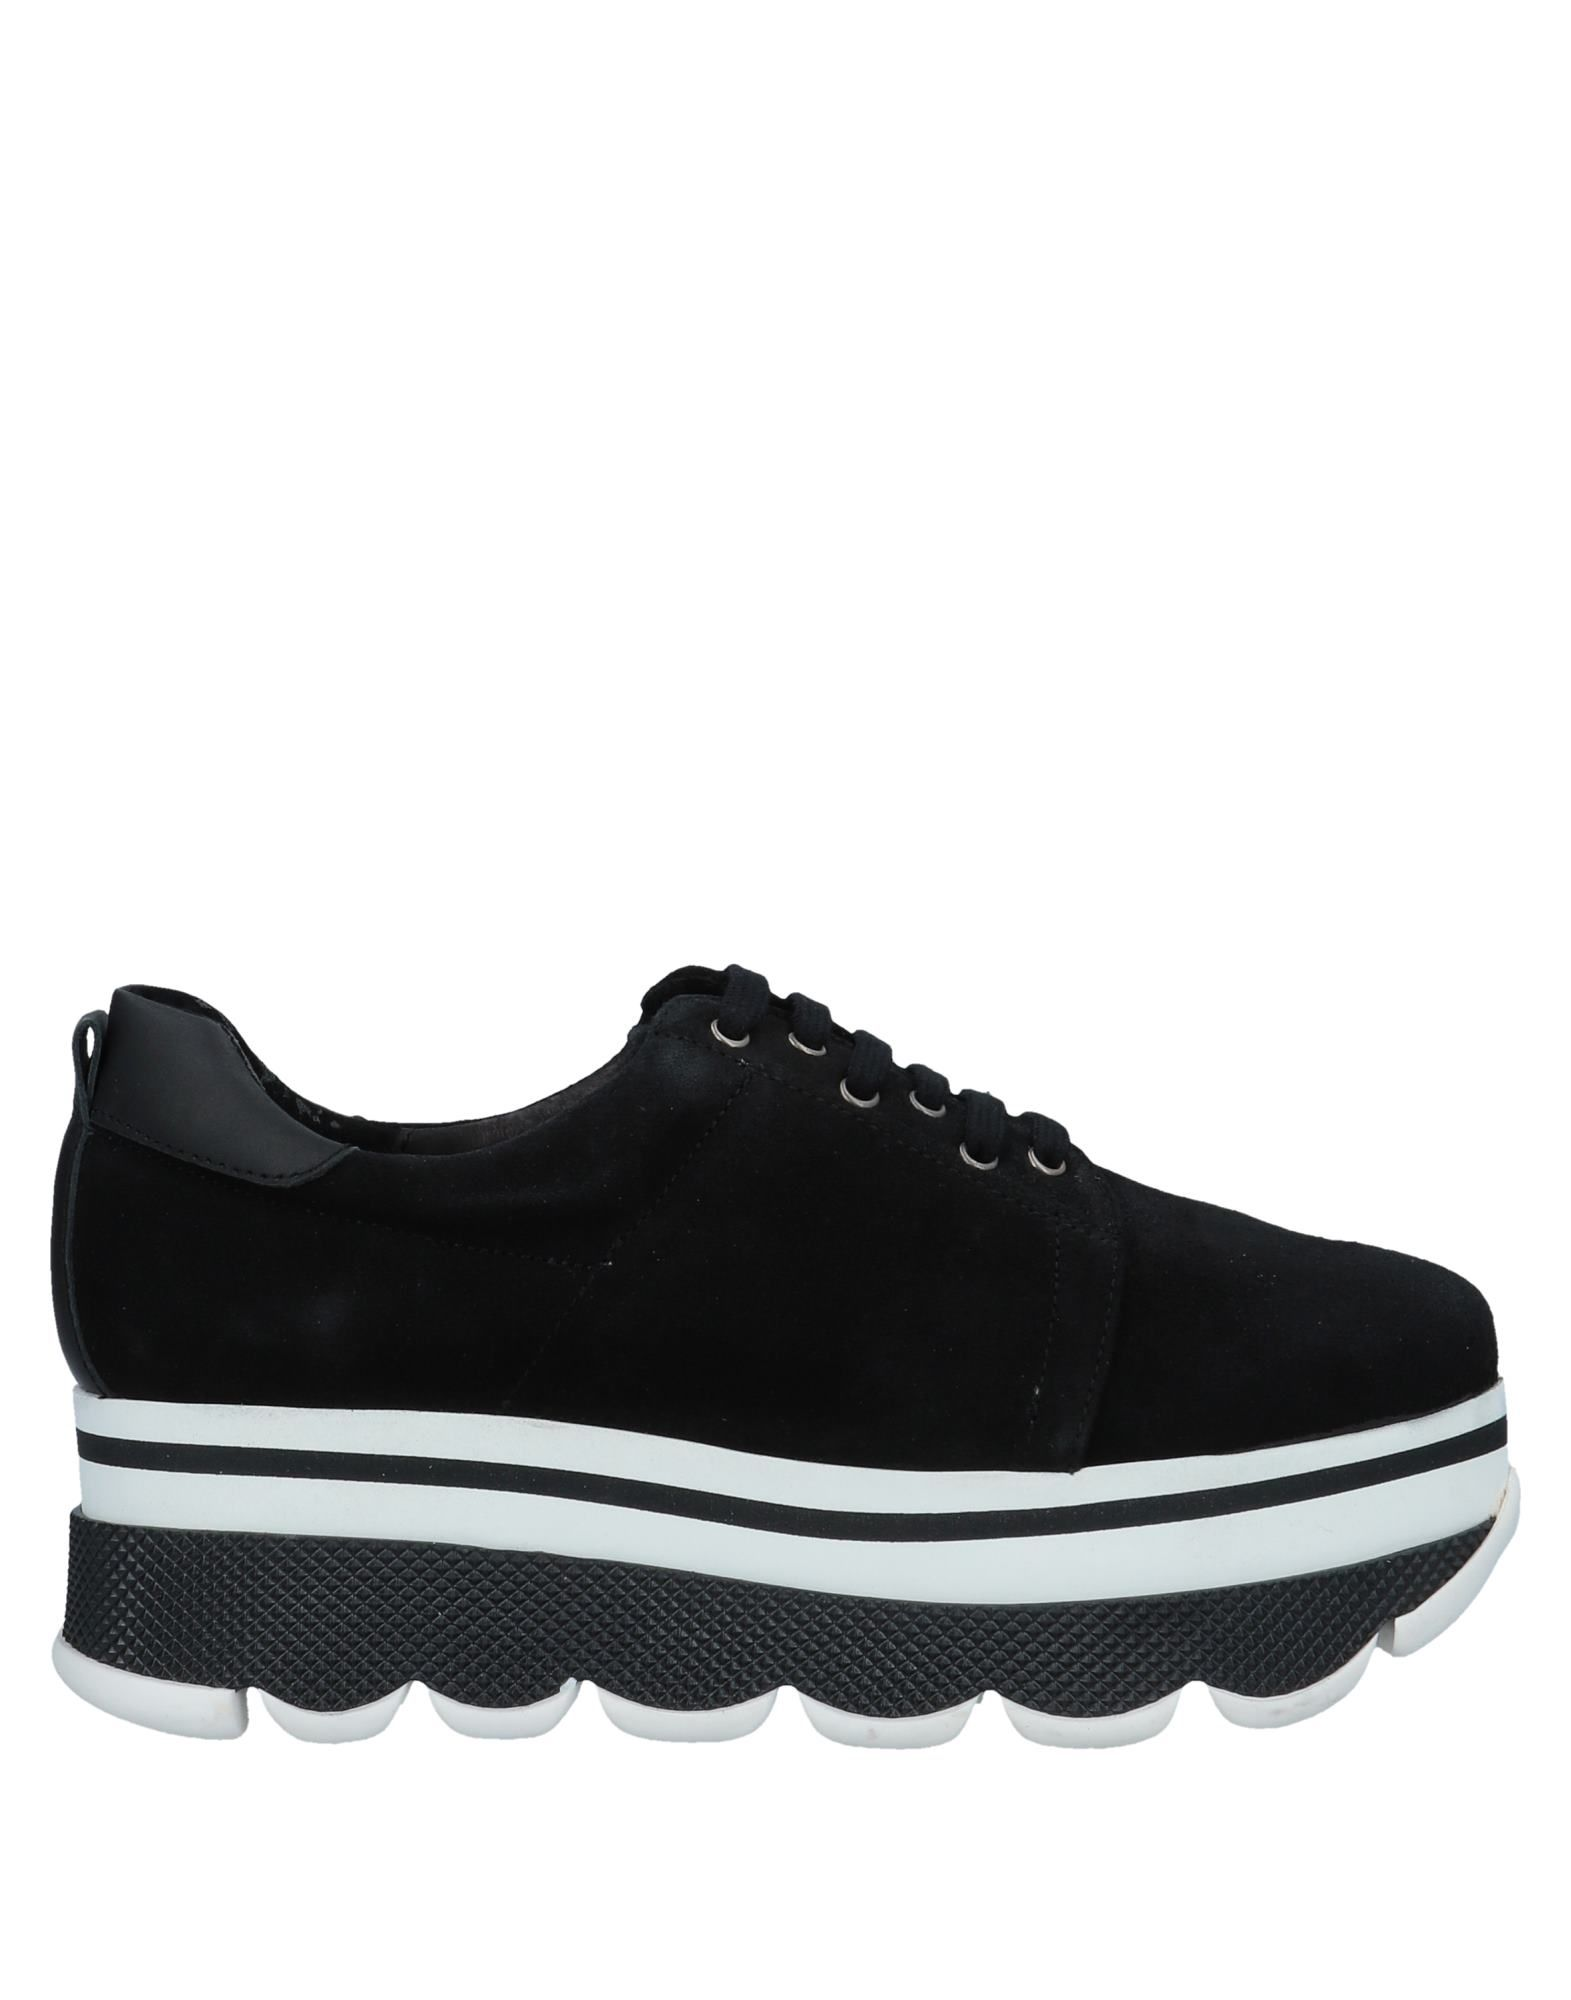 Flavio Creation Sneakers Damen  11552963MJ Gute Qualität beliebte Schuhe